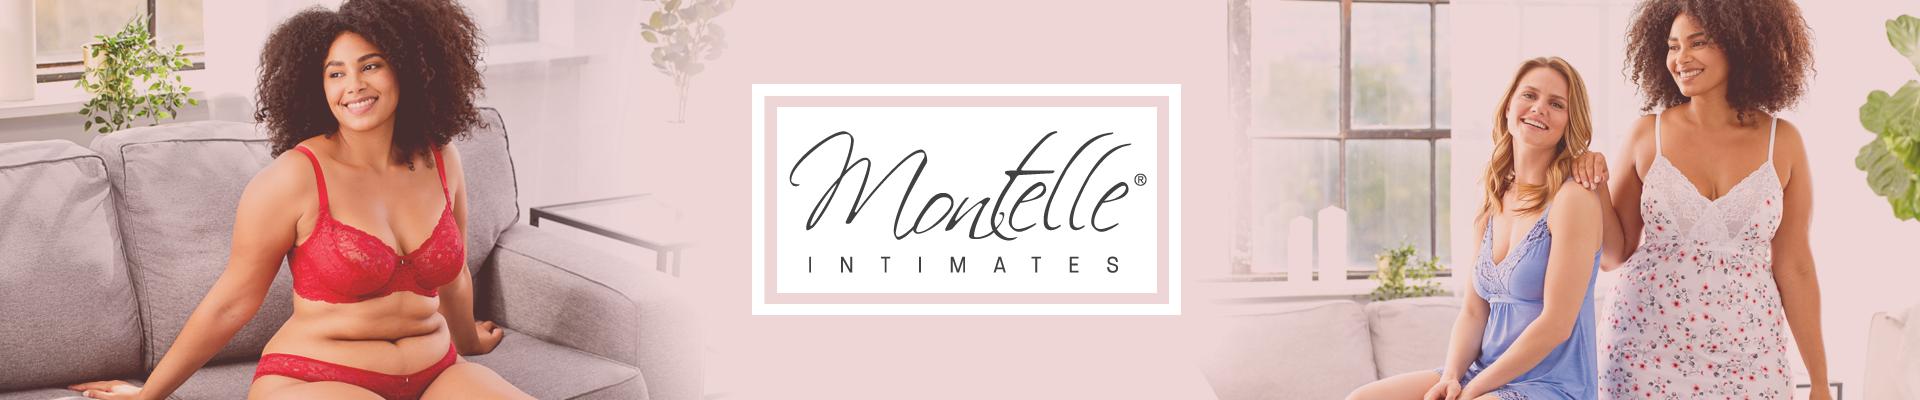 Montelle Spring 2020